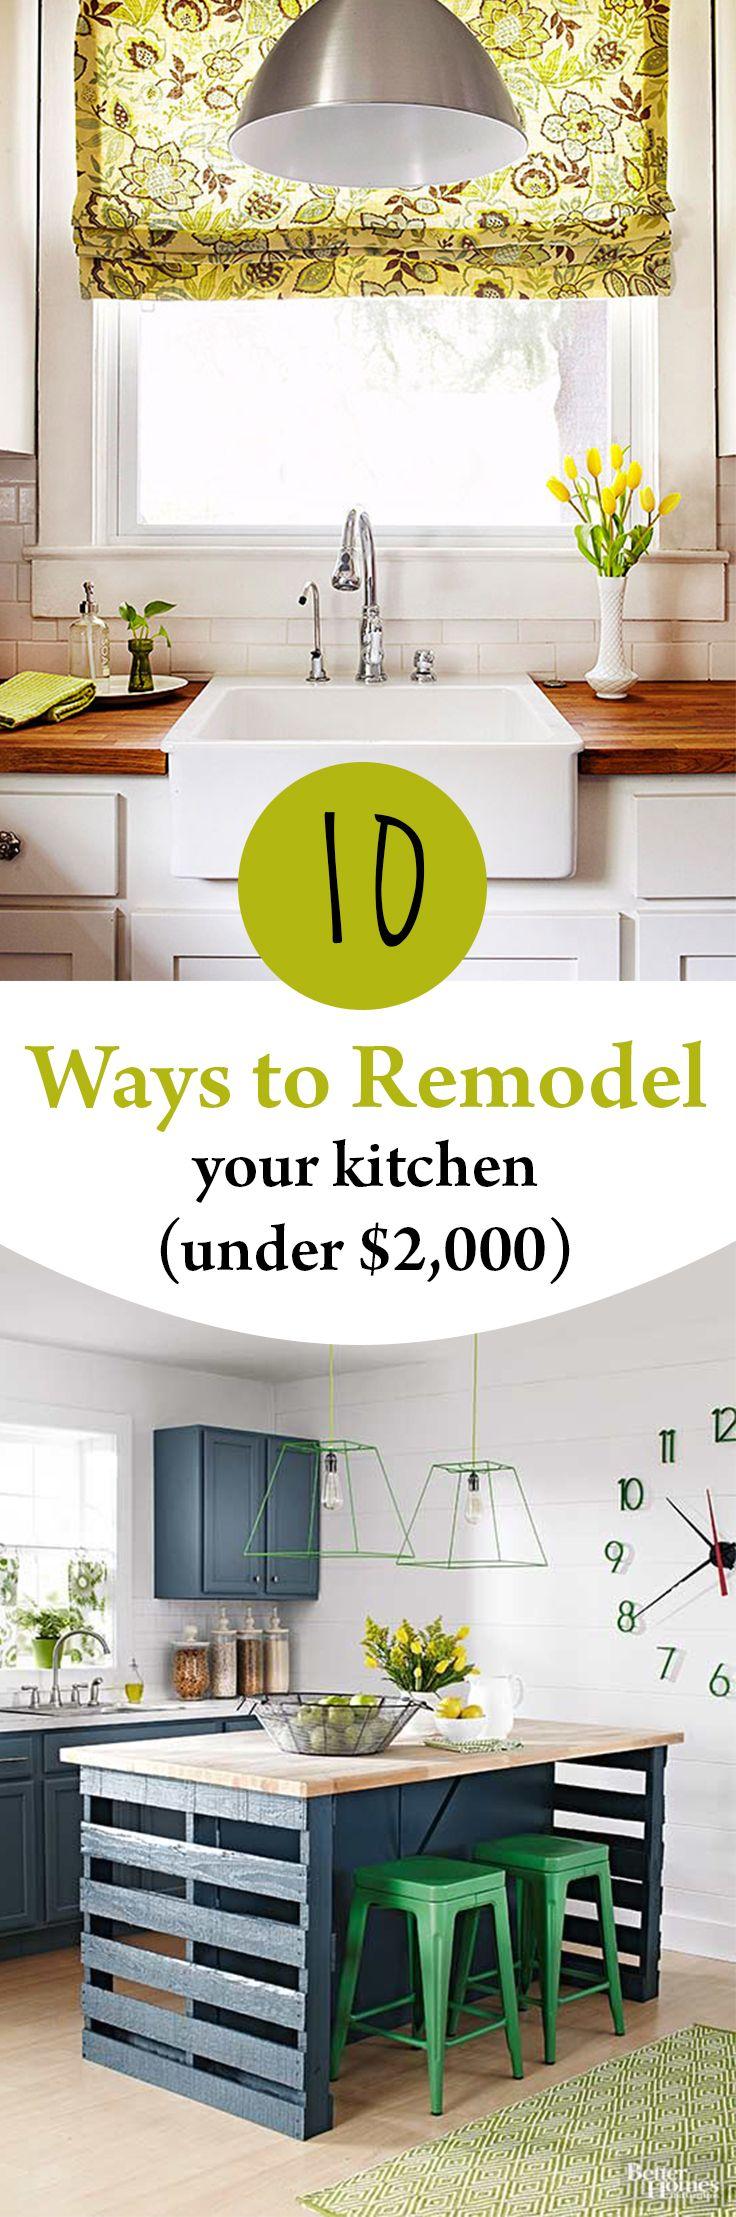 Ways To Remodel Your Kitchen Under Cheap Kitchen - Cheap ways to remodel a kitchen